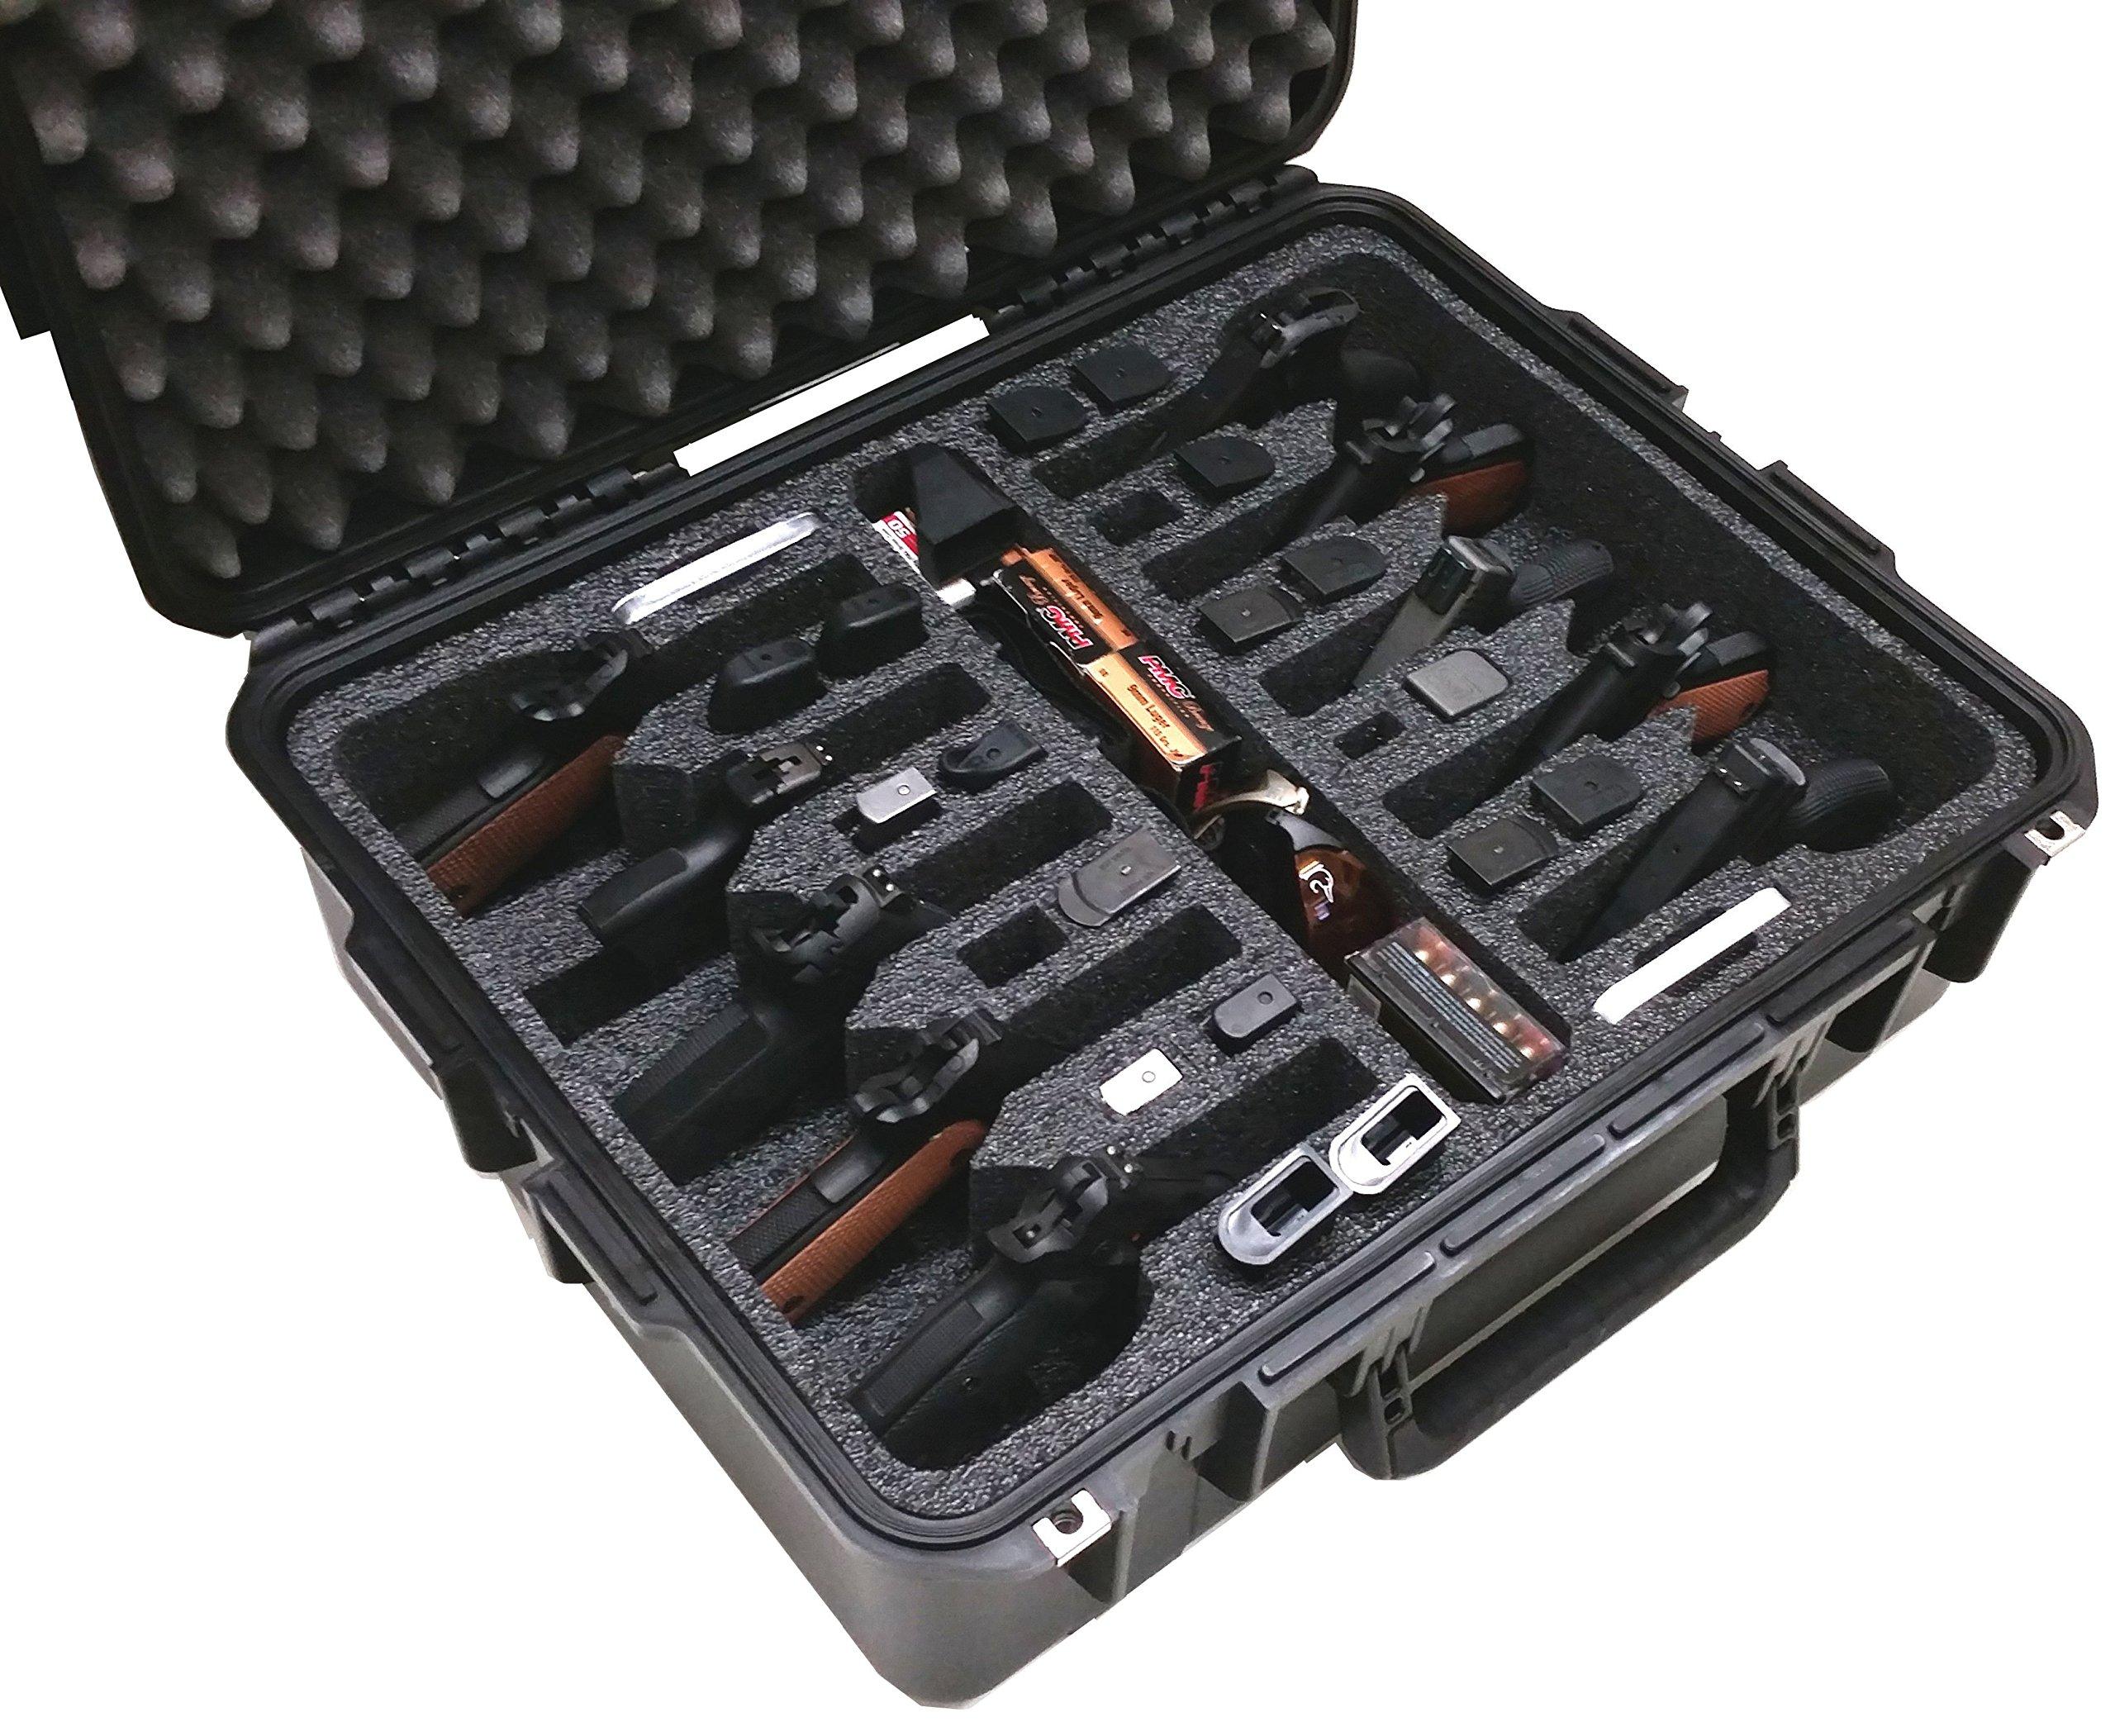 Case Club Waterproof 10 Pistol Case with Silica Gel to Help Prevent Gun Rust